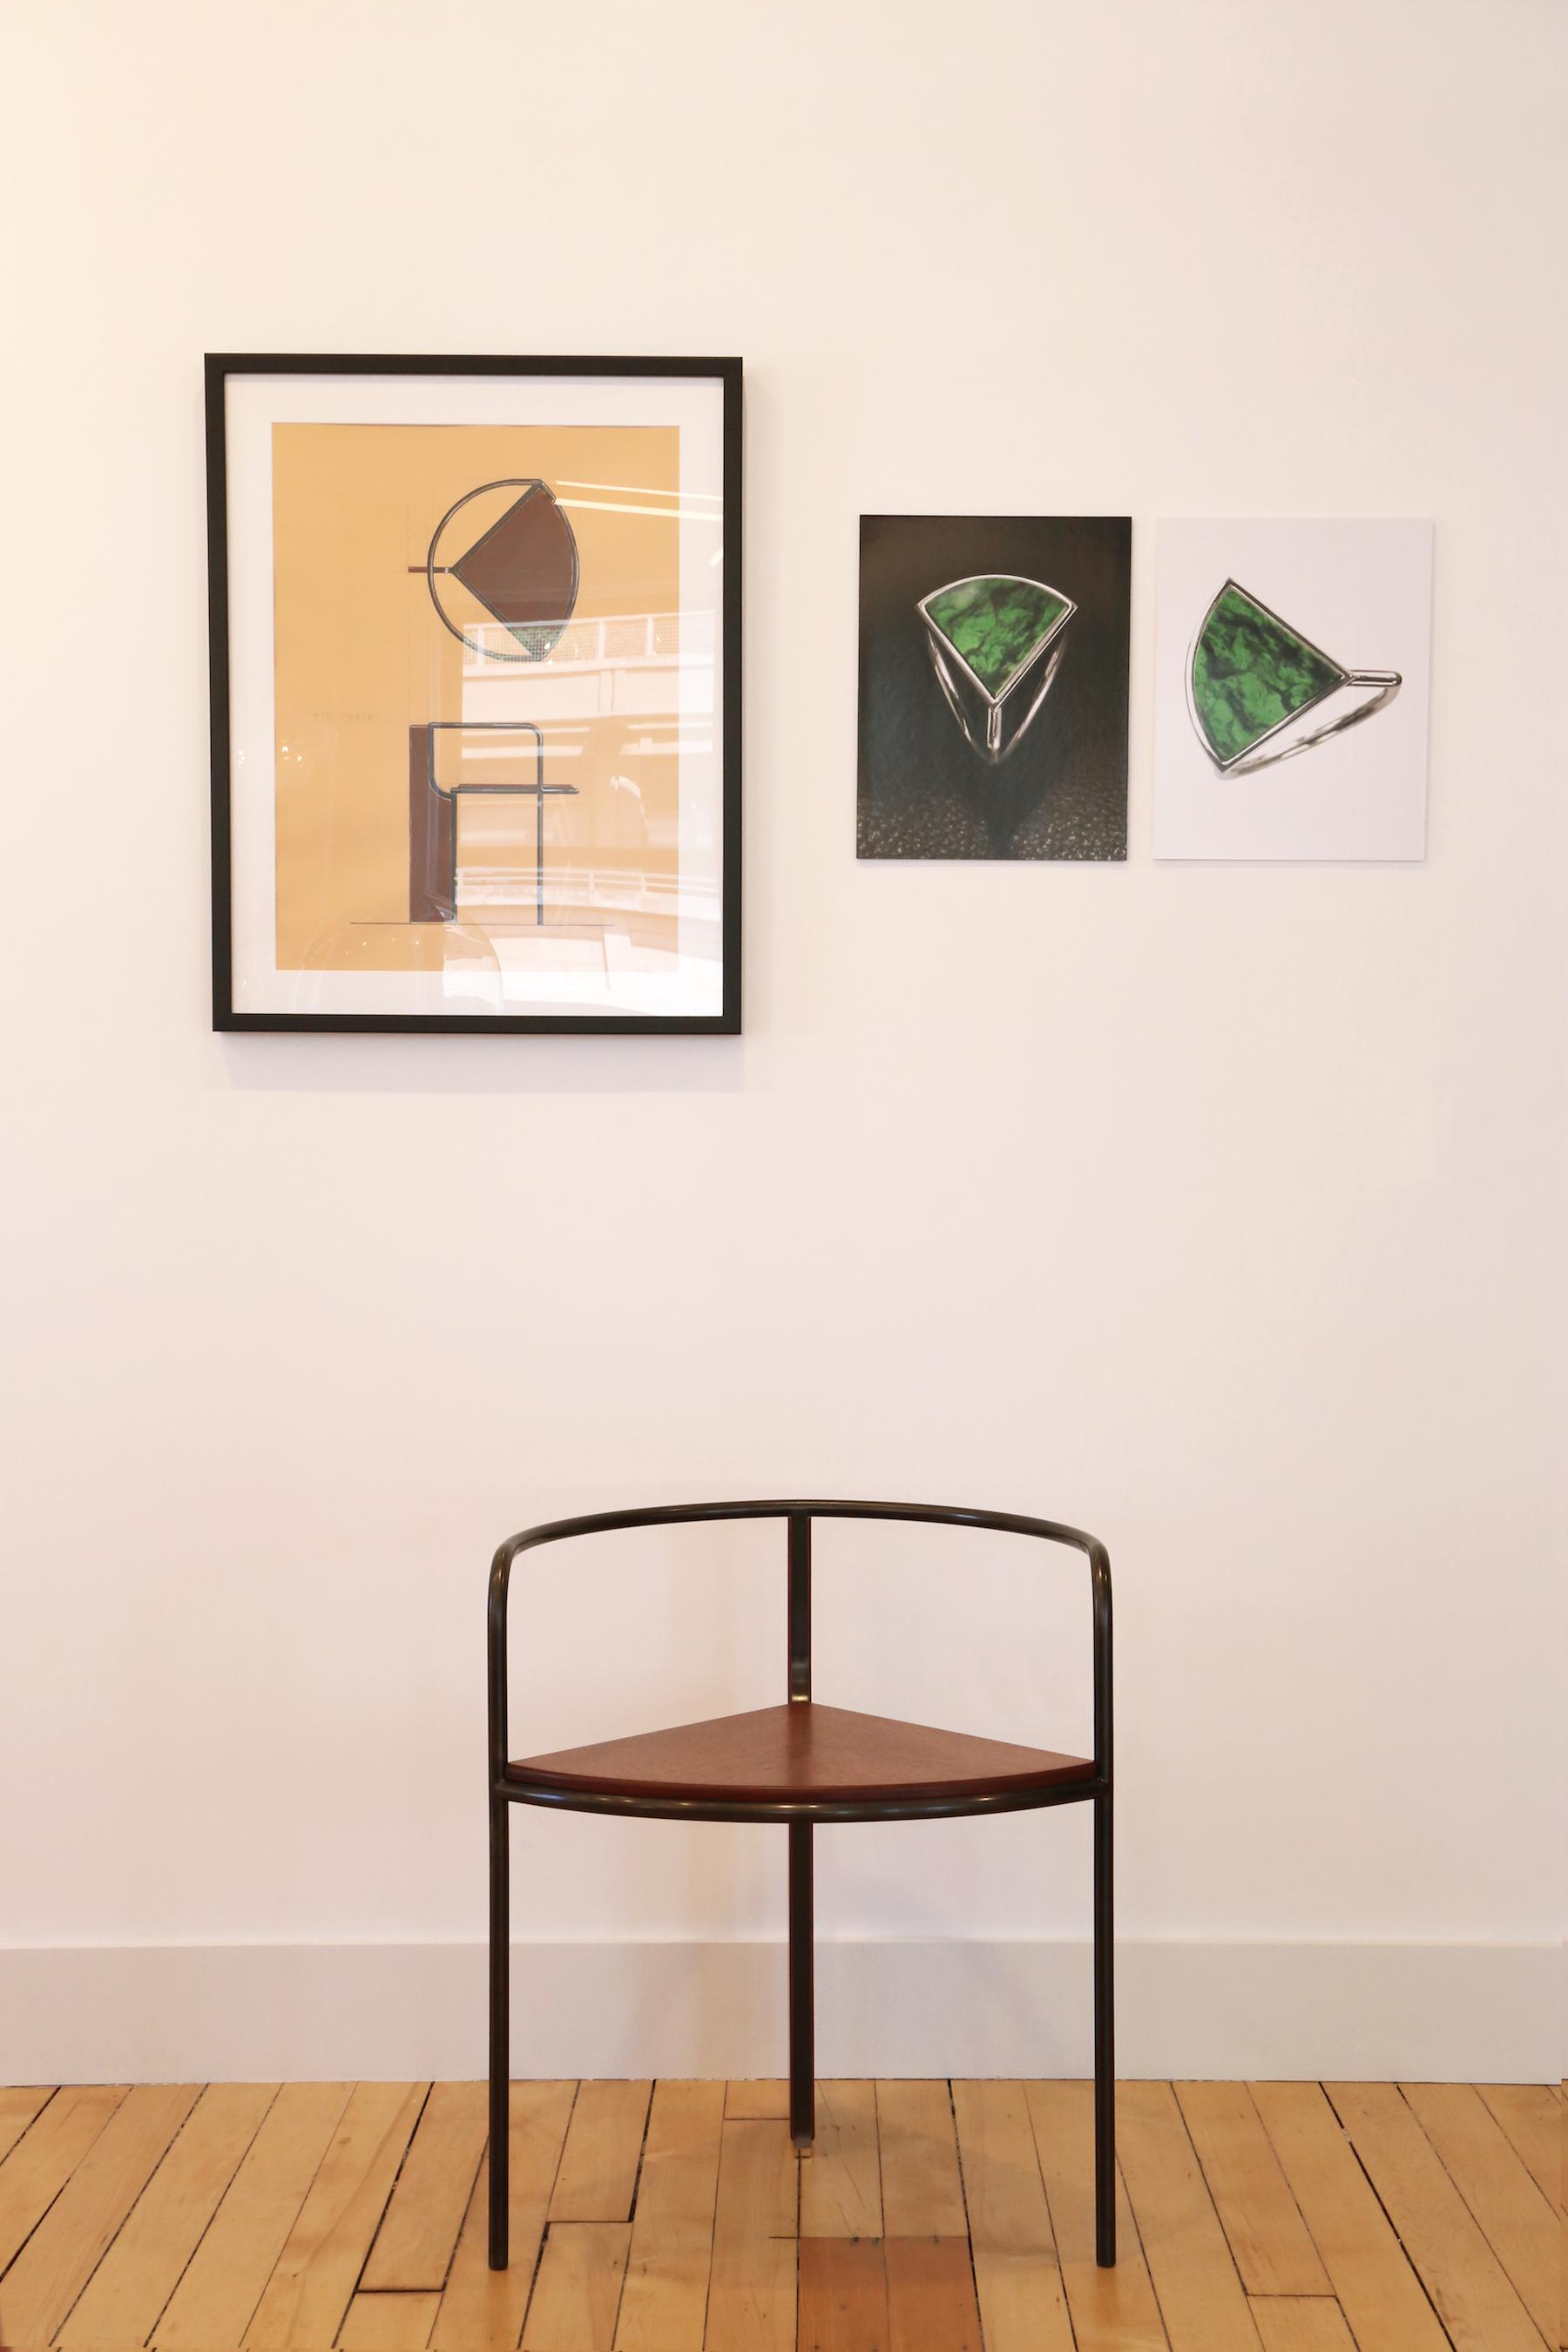 Fin Chair by PELLE